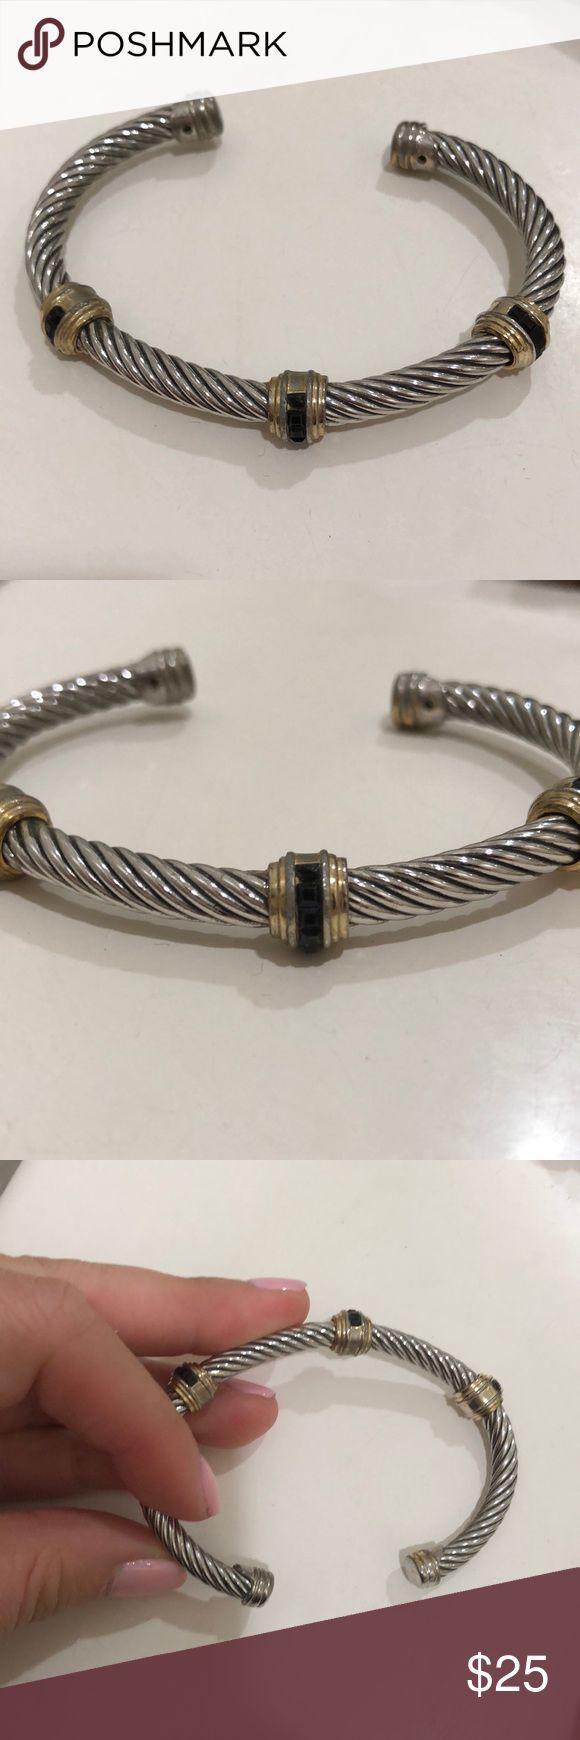 Brighton bracelet cuff silver Brighton bracelet cuff with gold and black detailing. looks new! Brighton Jewelry Bracelets